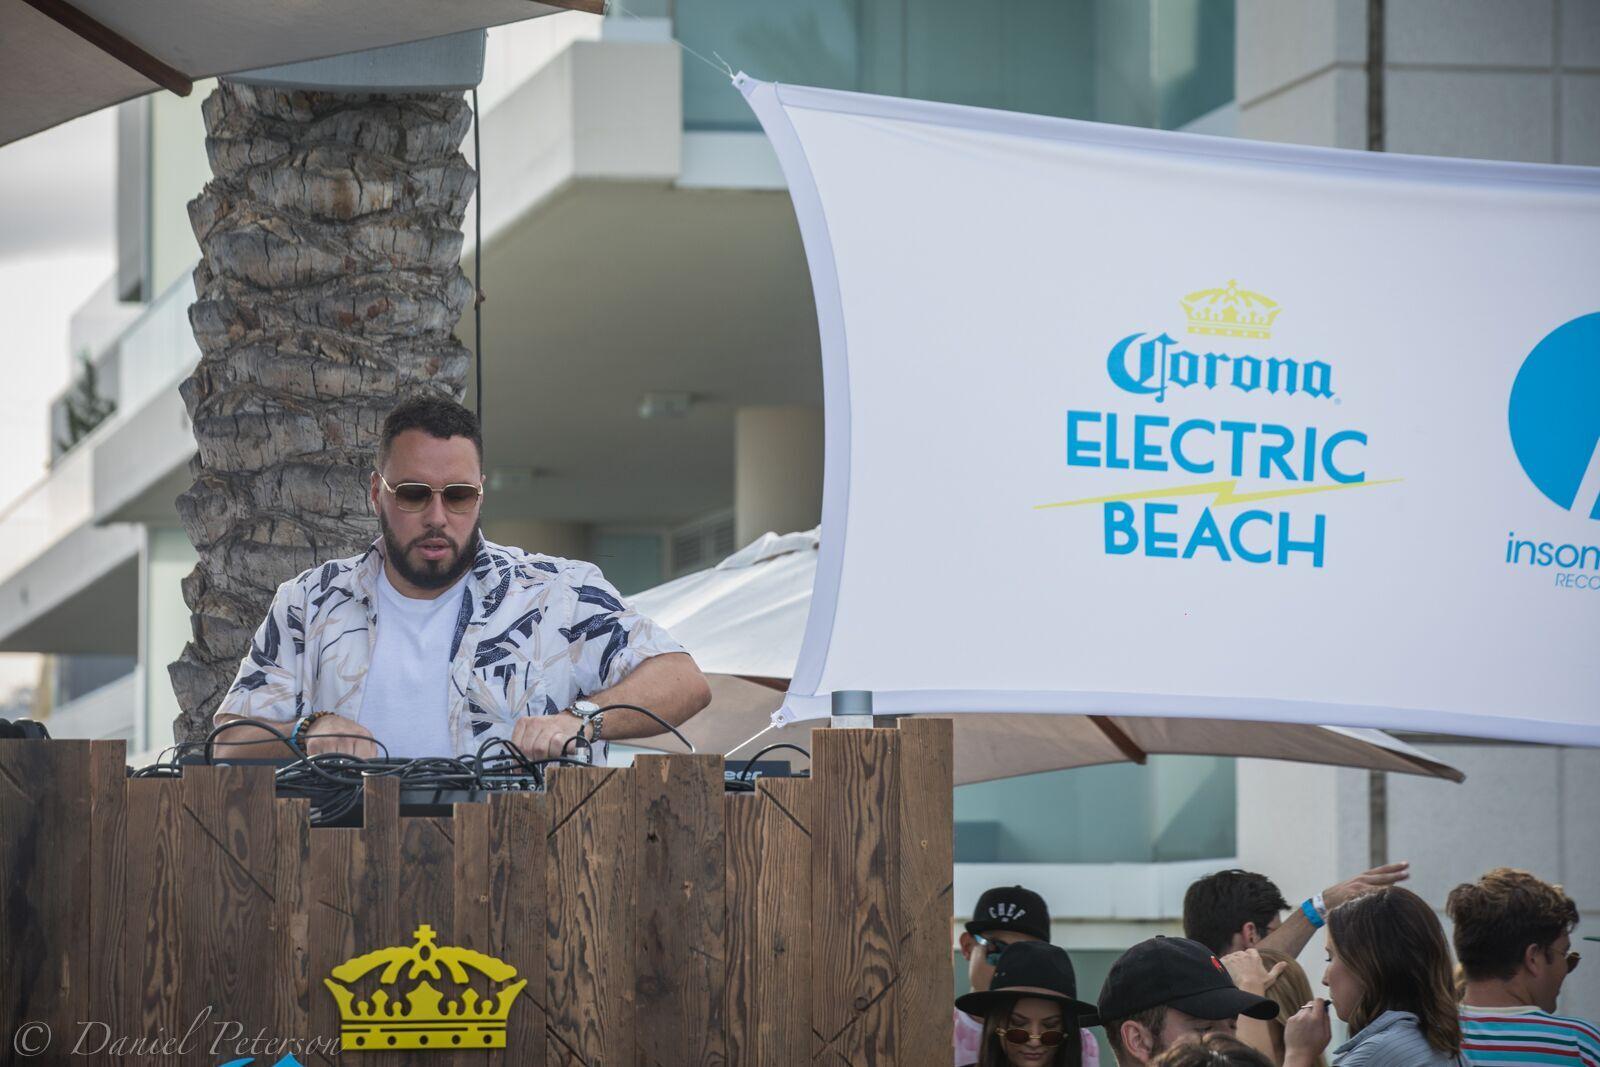 Corona Electric Beach LA by Daniel Peterson Music Festival Central-23_preview.jpeg